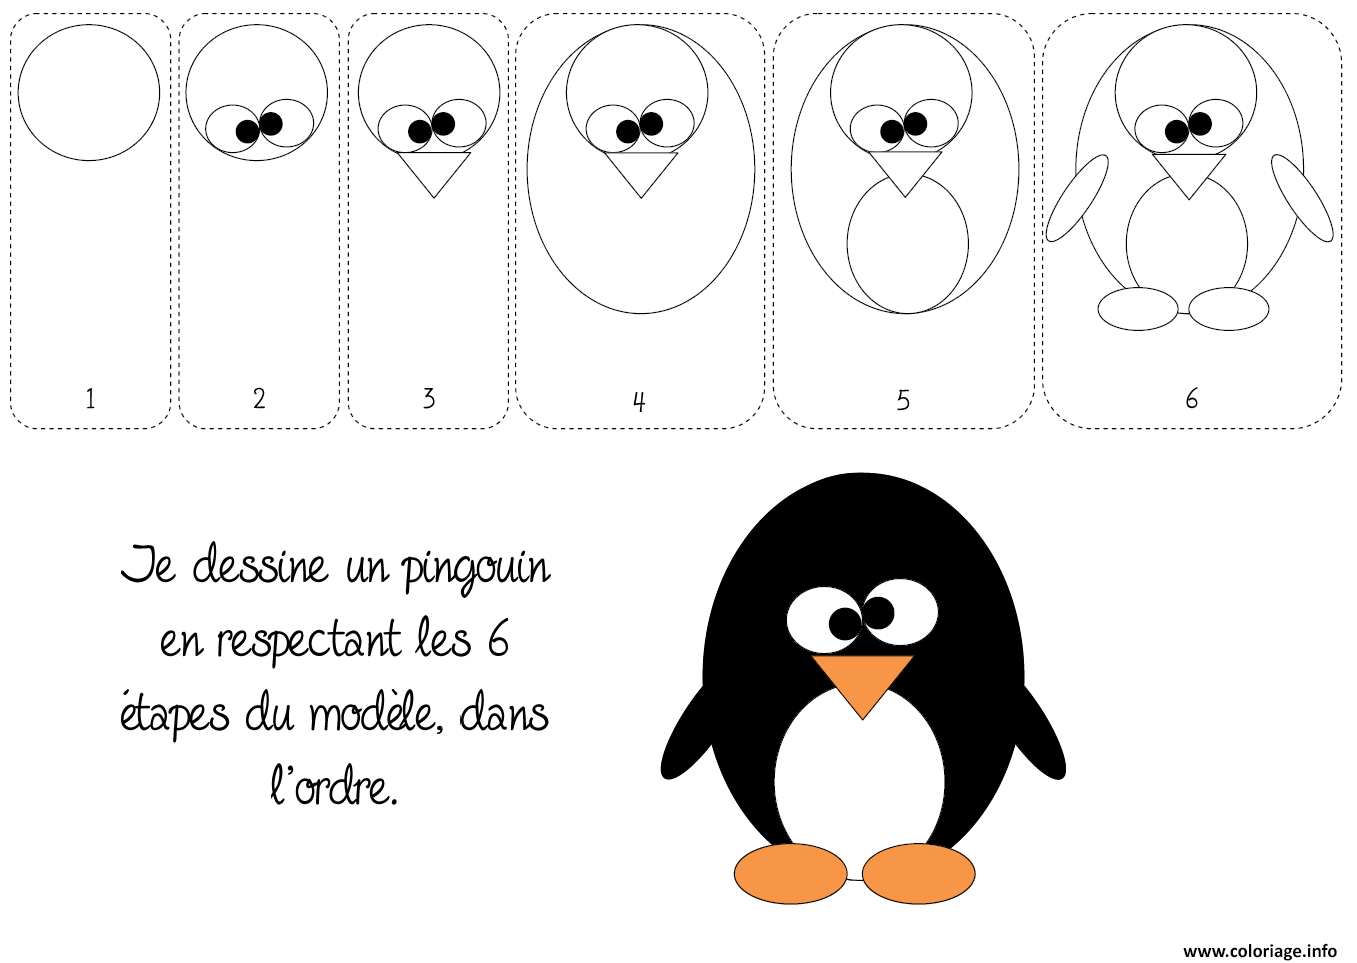 Coloriage comment dessiner un pingouin dessin - Pingouin rigolo ...